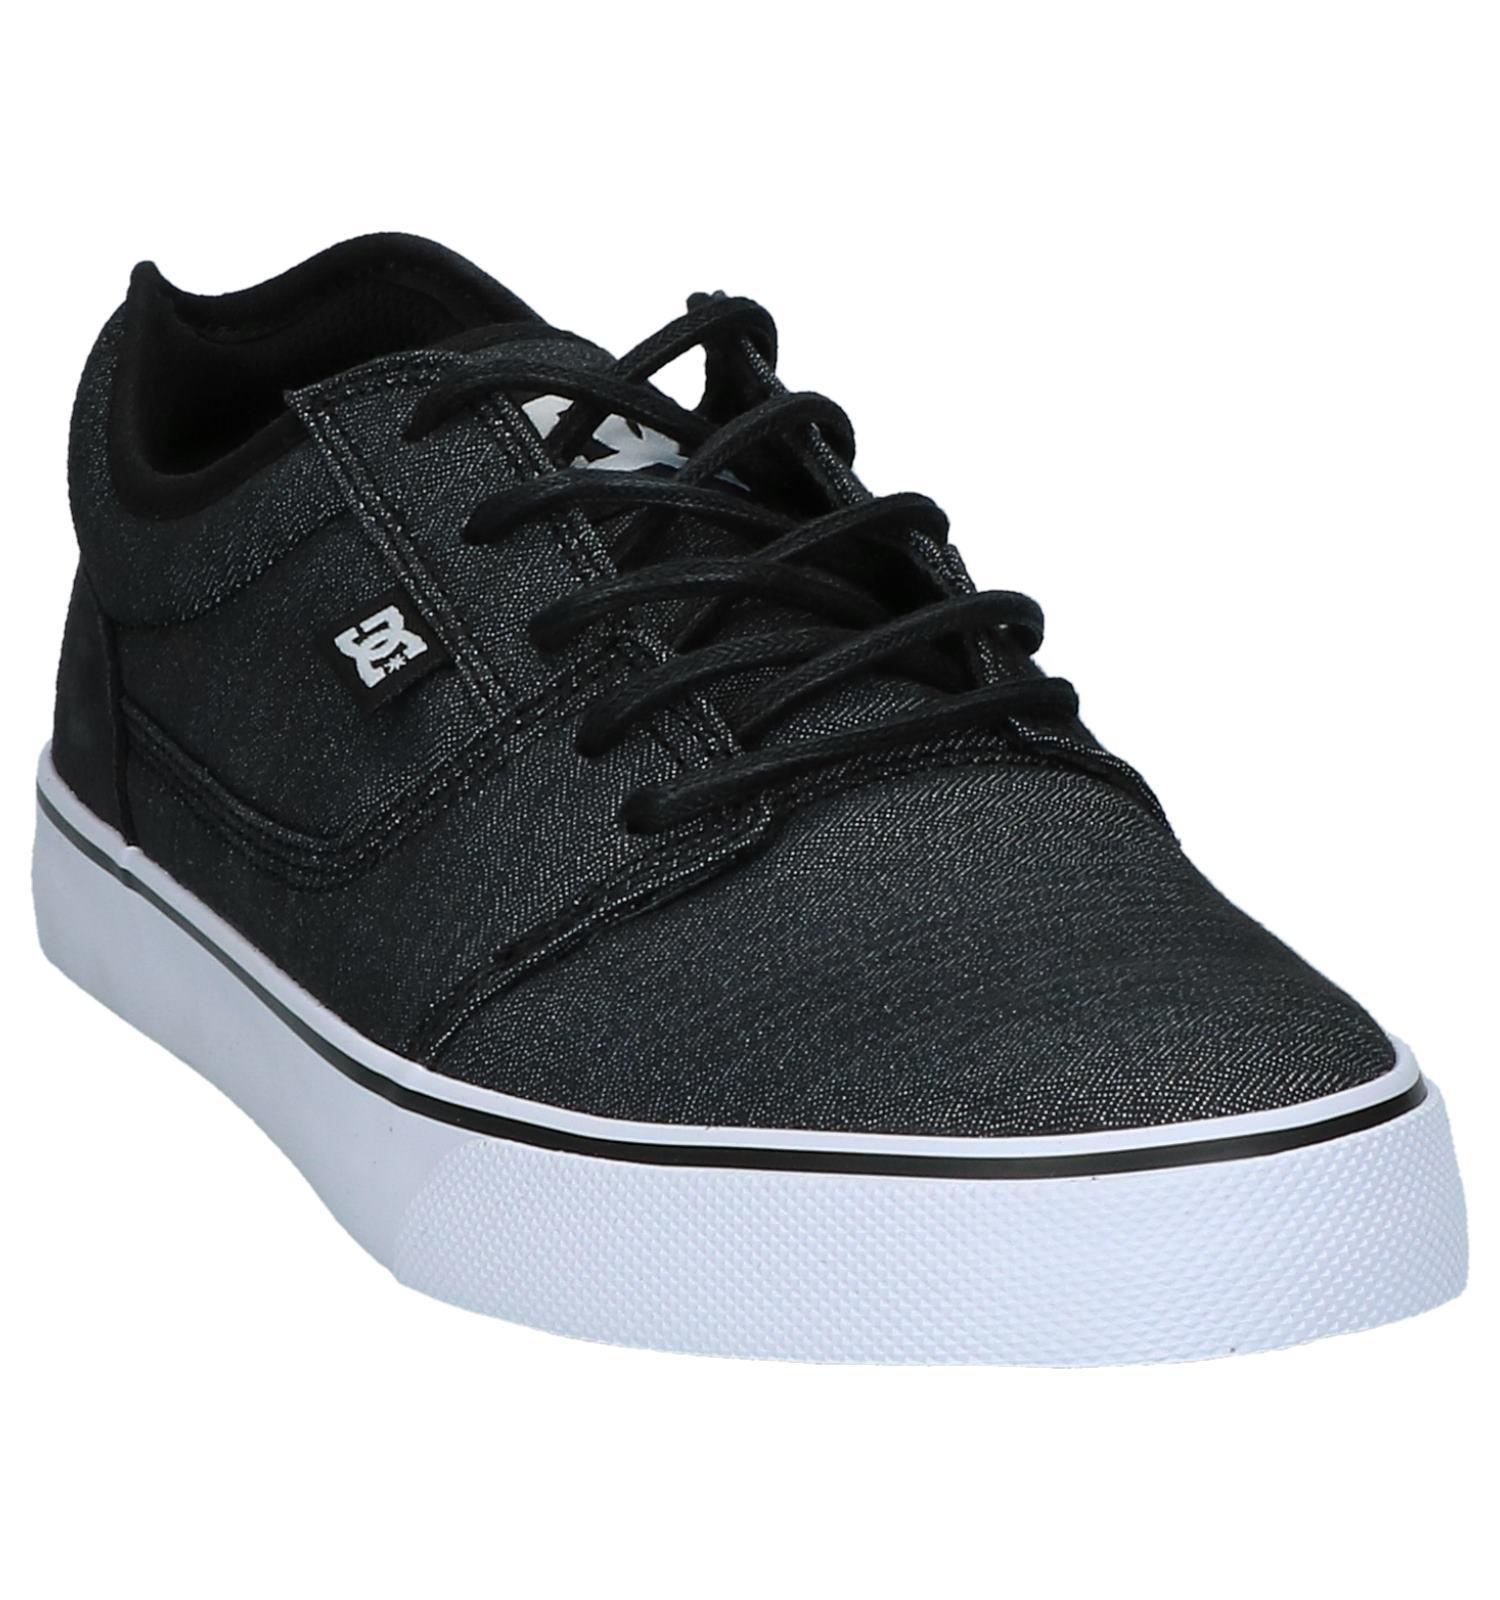 Se Dc Tonik Shoes Tx Zwarte Skateschoenen Tl1KJcF3